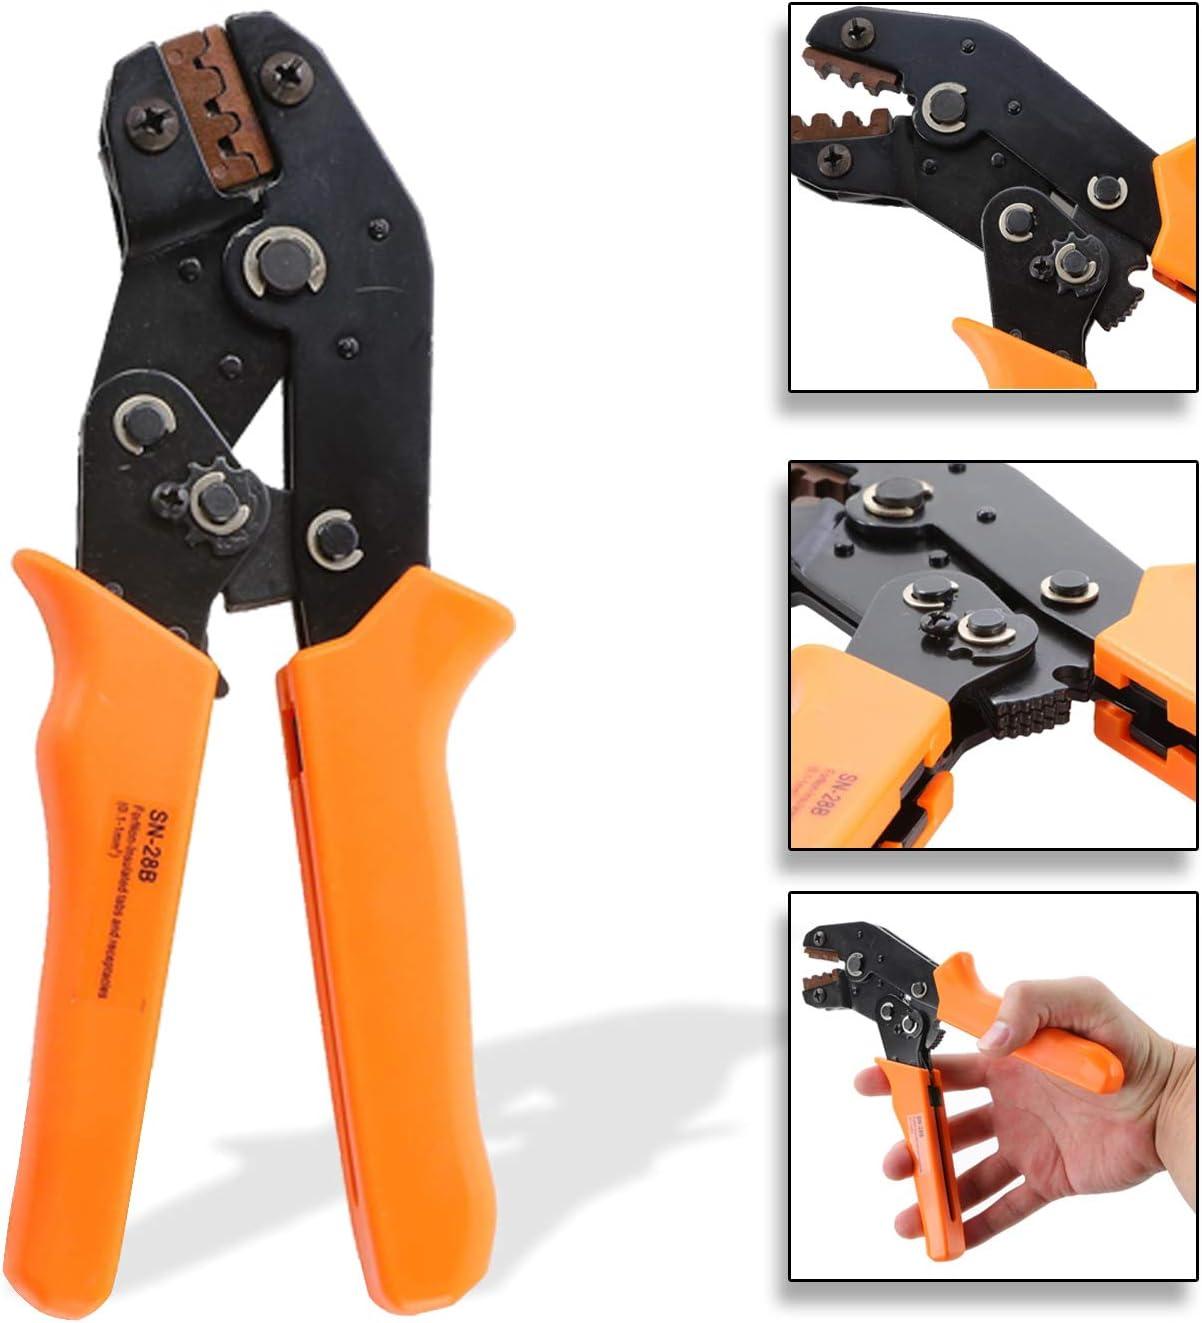 Ratchet Crimper Plier SN-28B Dyna-Living Crimping Tool Kit 1550PCS Combination